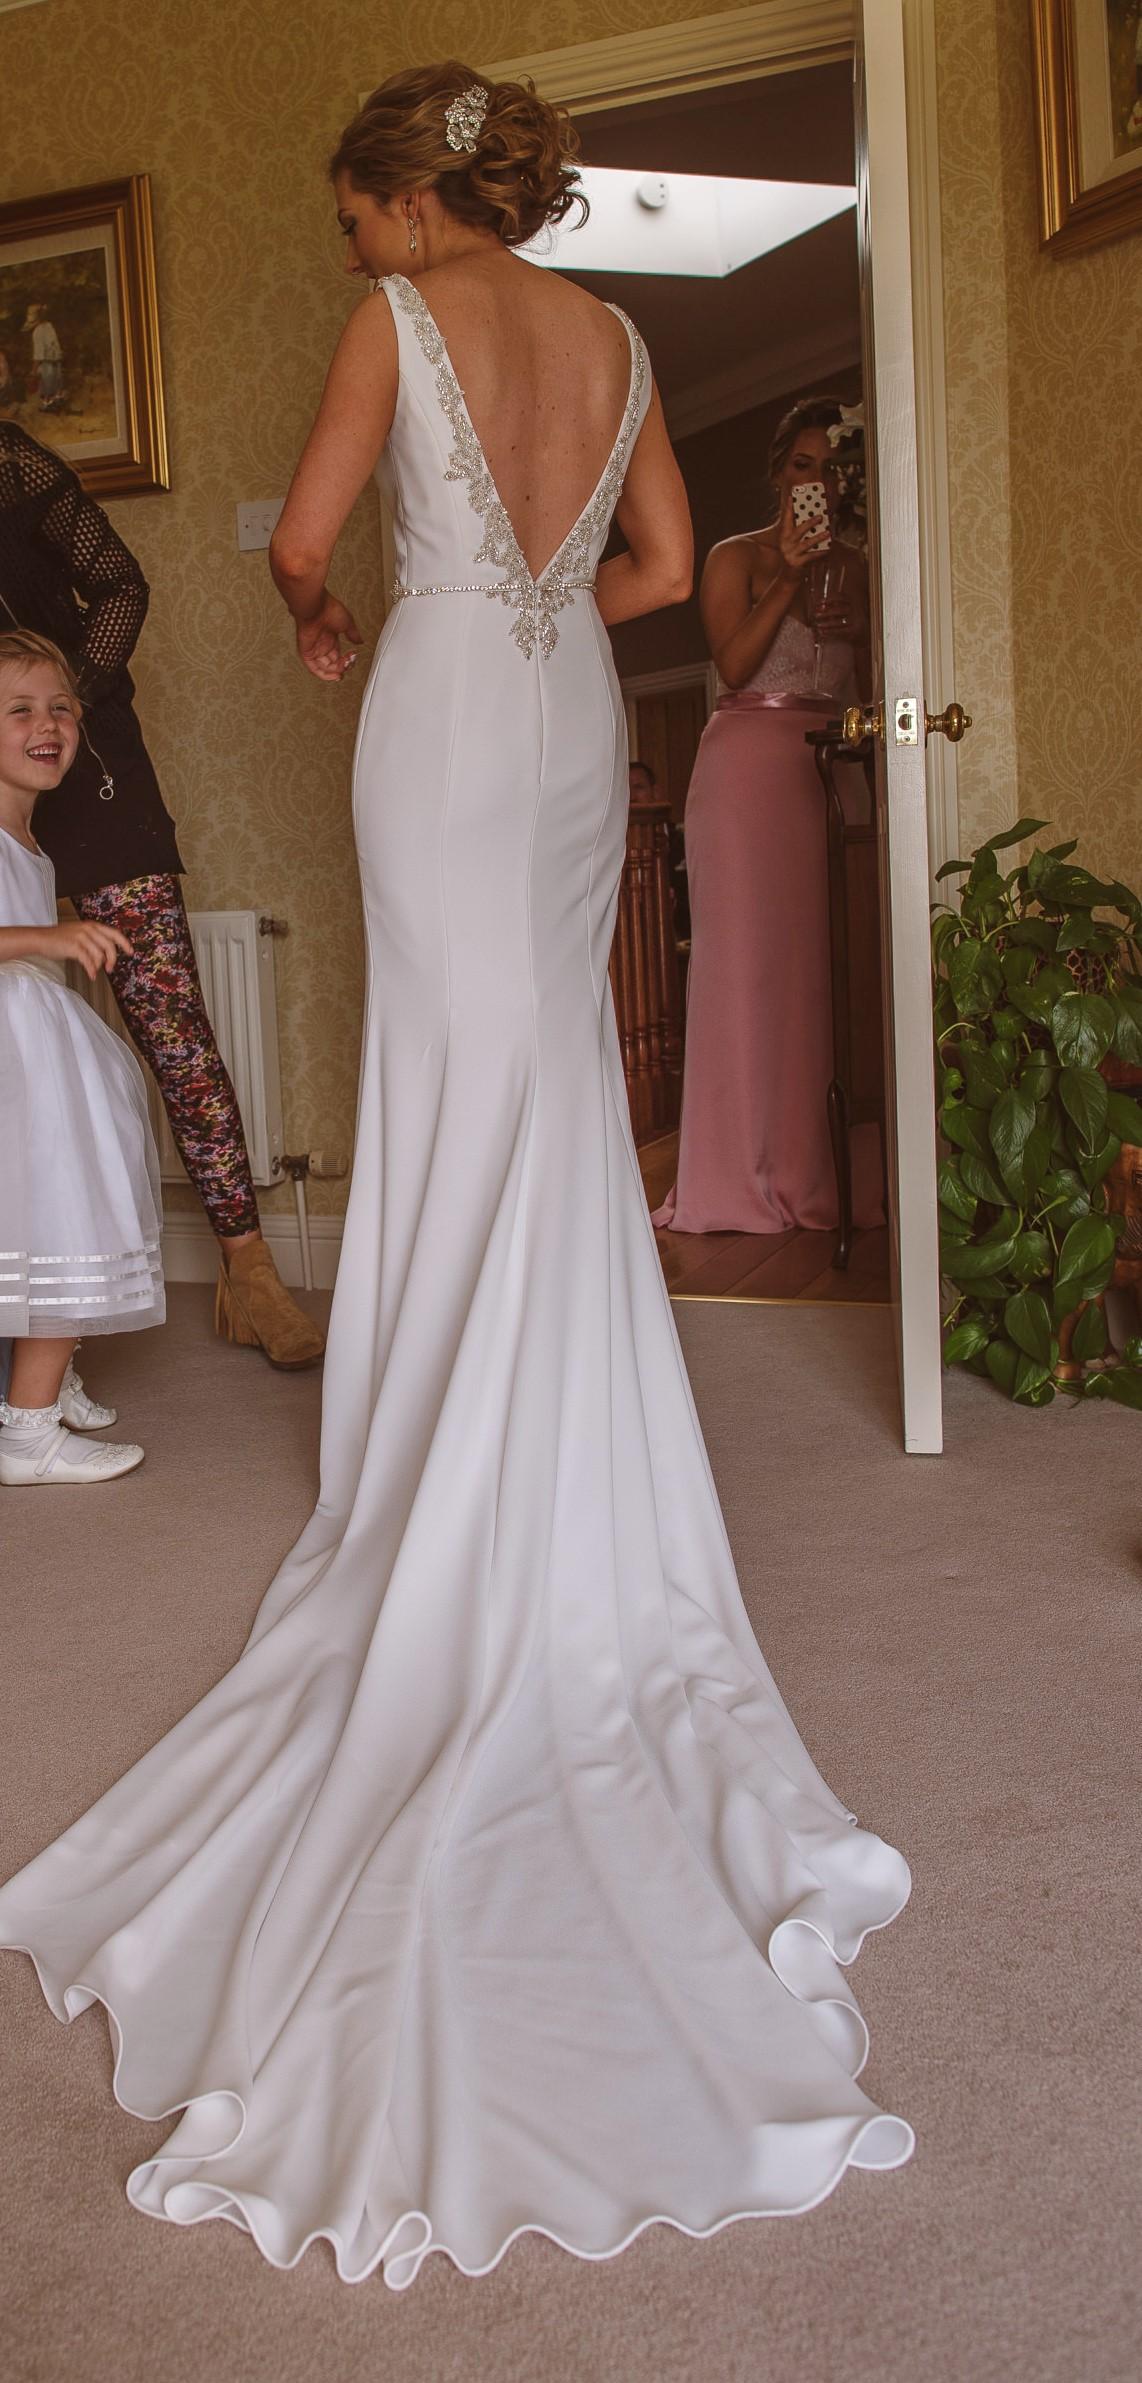 Pronovias Spring 2018 Wedding Dress Collection | Martha